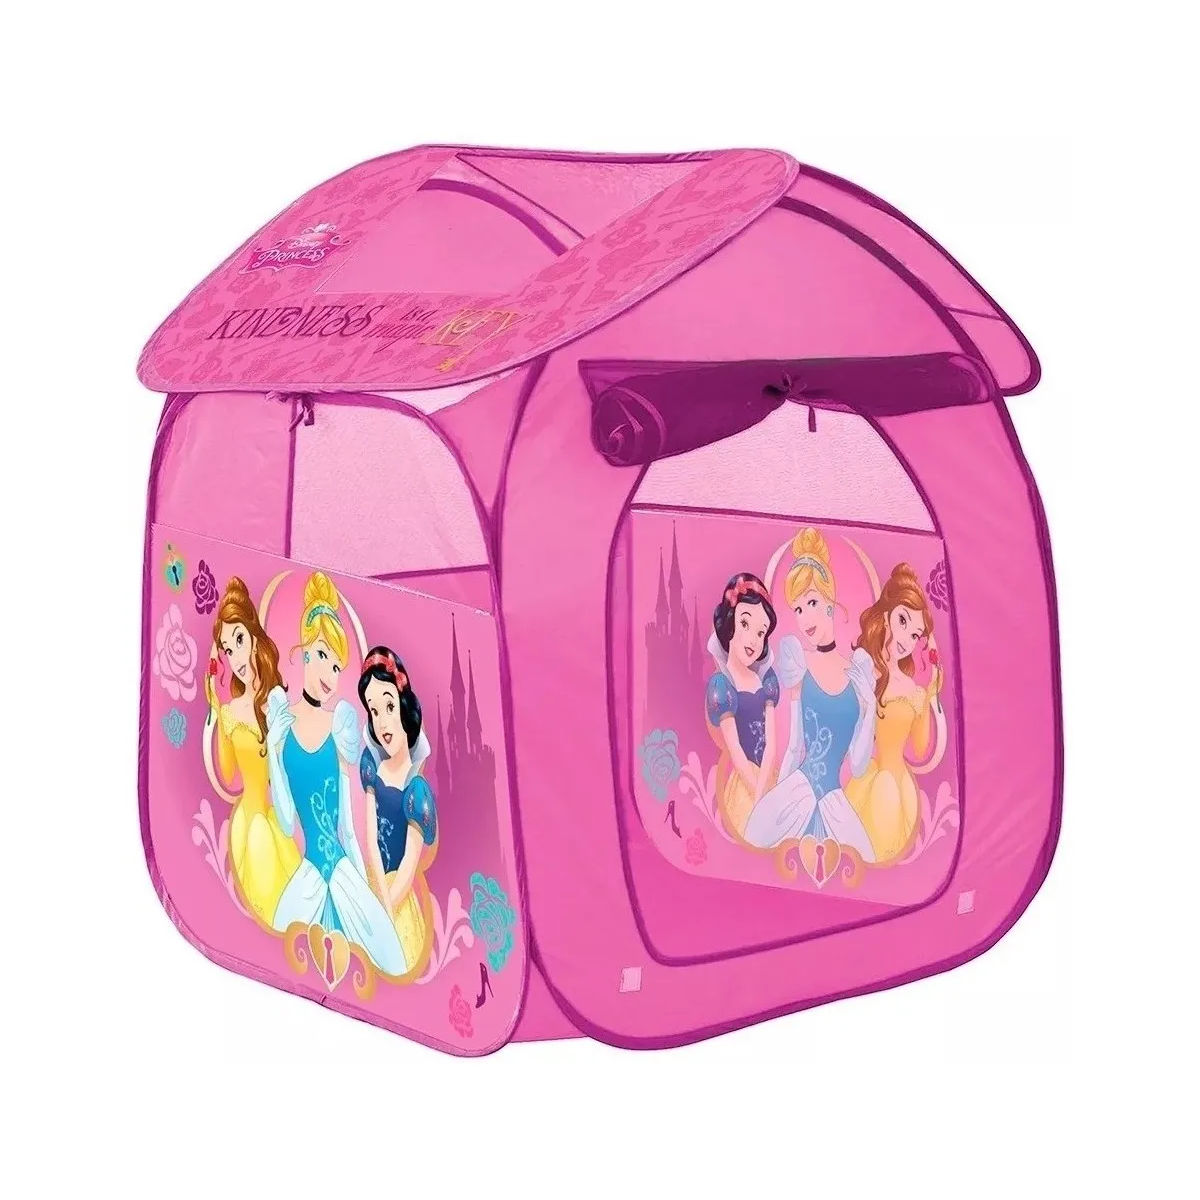 Barraca Portátil Princesas Dobrável Infantil Zippy Toys 3864